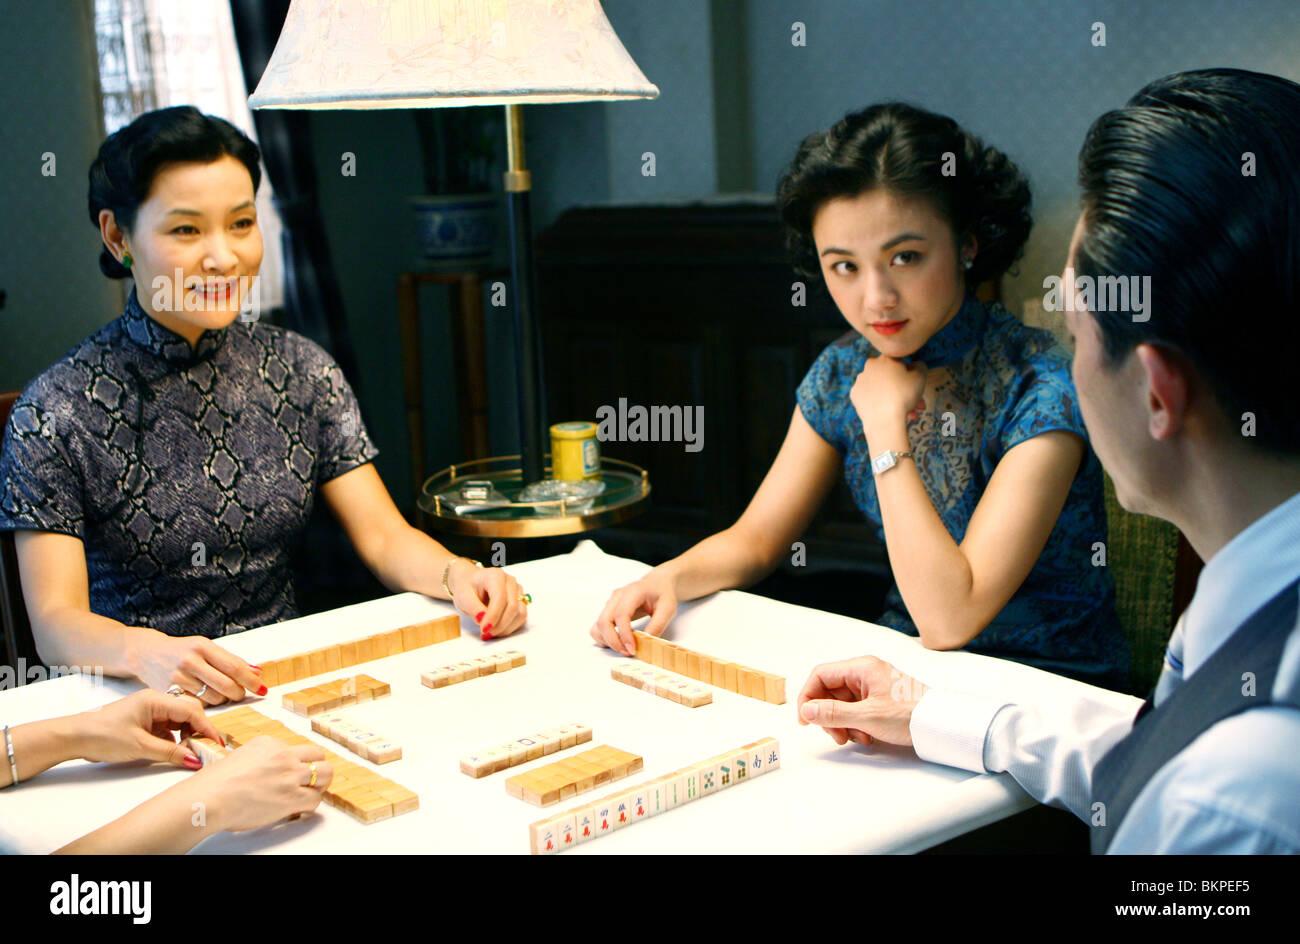 SE, JIE (2007) LUST (ALT) JOAN CHEN, TANG WEI, TONY LEUNG ANG LEE (DIR) SEJI 008 - Stock Image